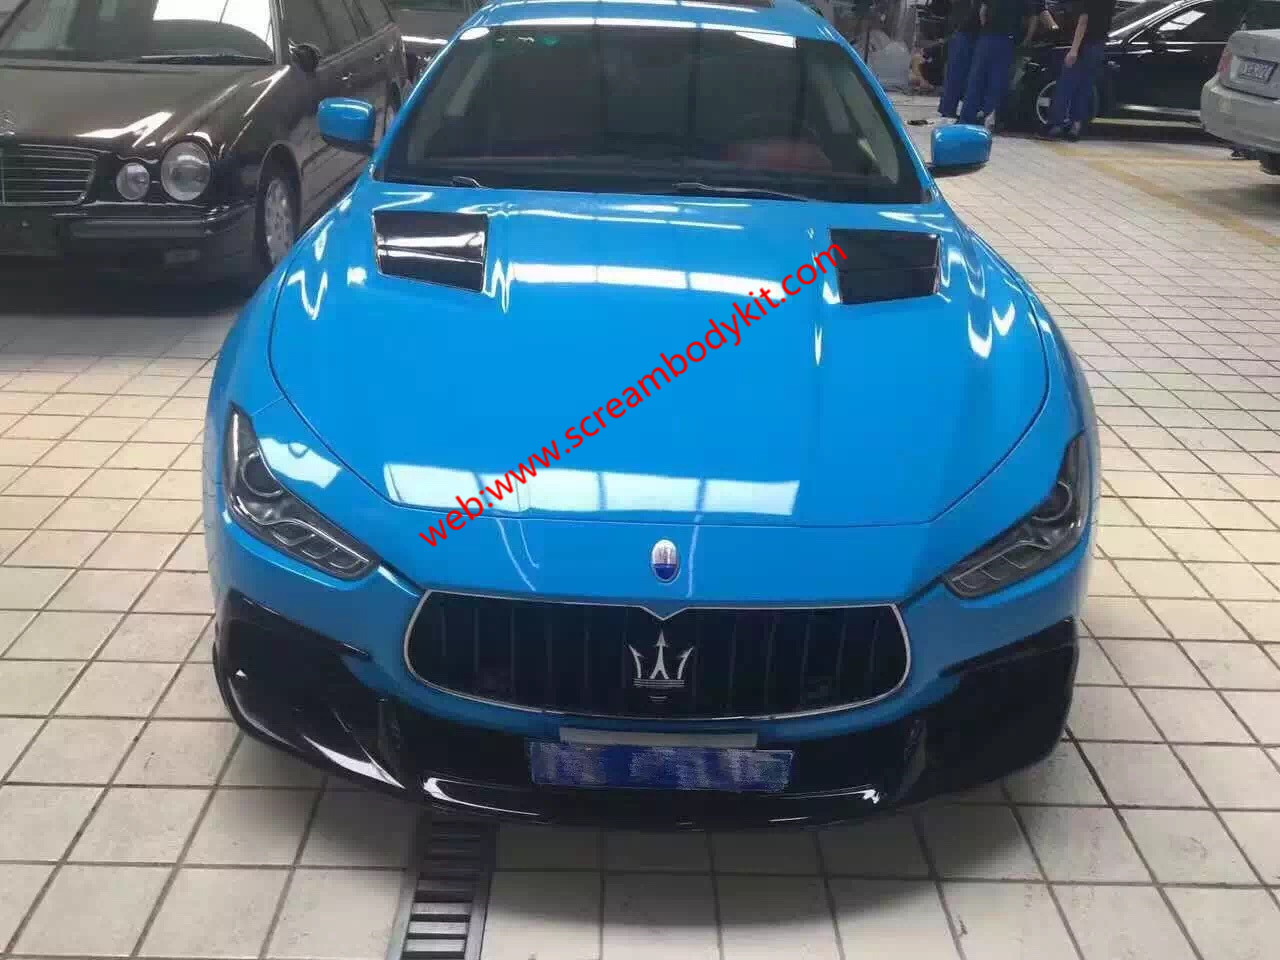 Maserati Ghibli update carbon fiber body kit ASPEC front lip after lip side skirts wing